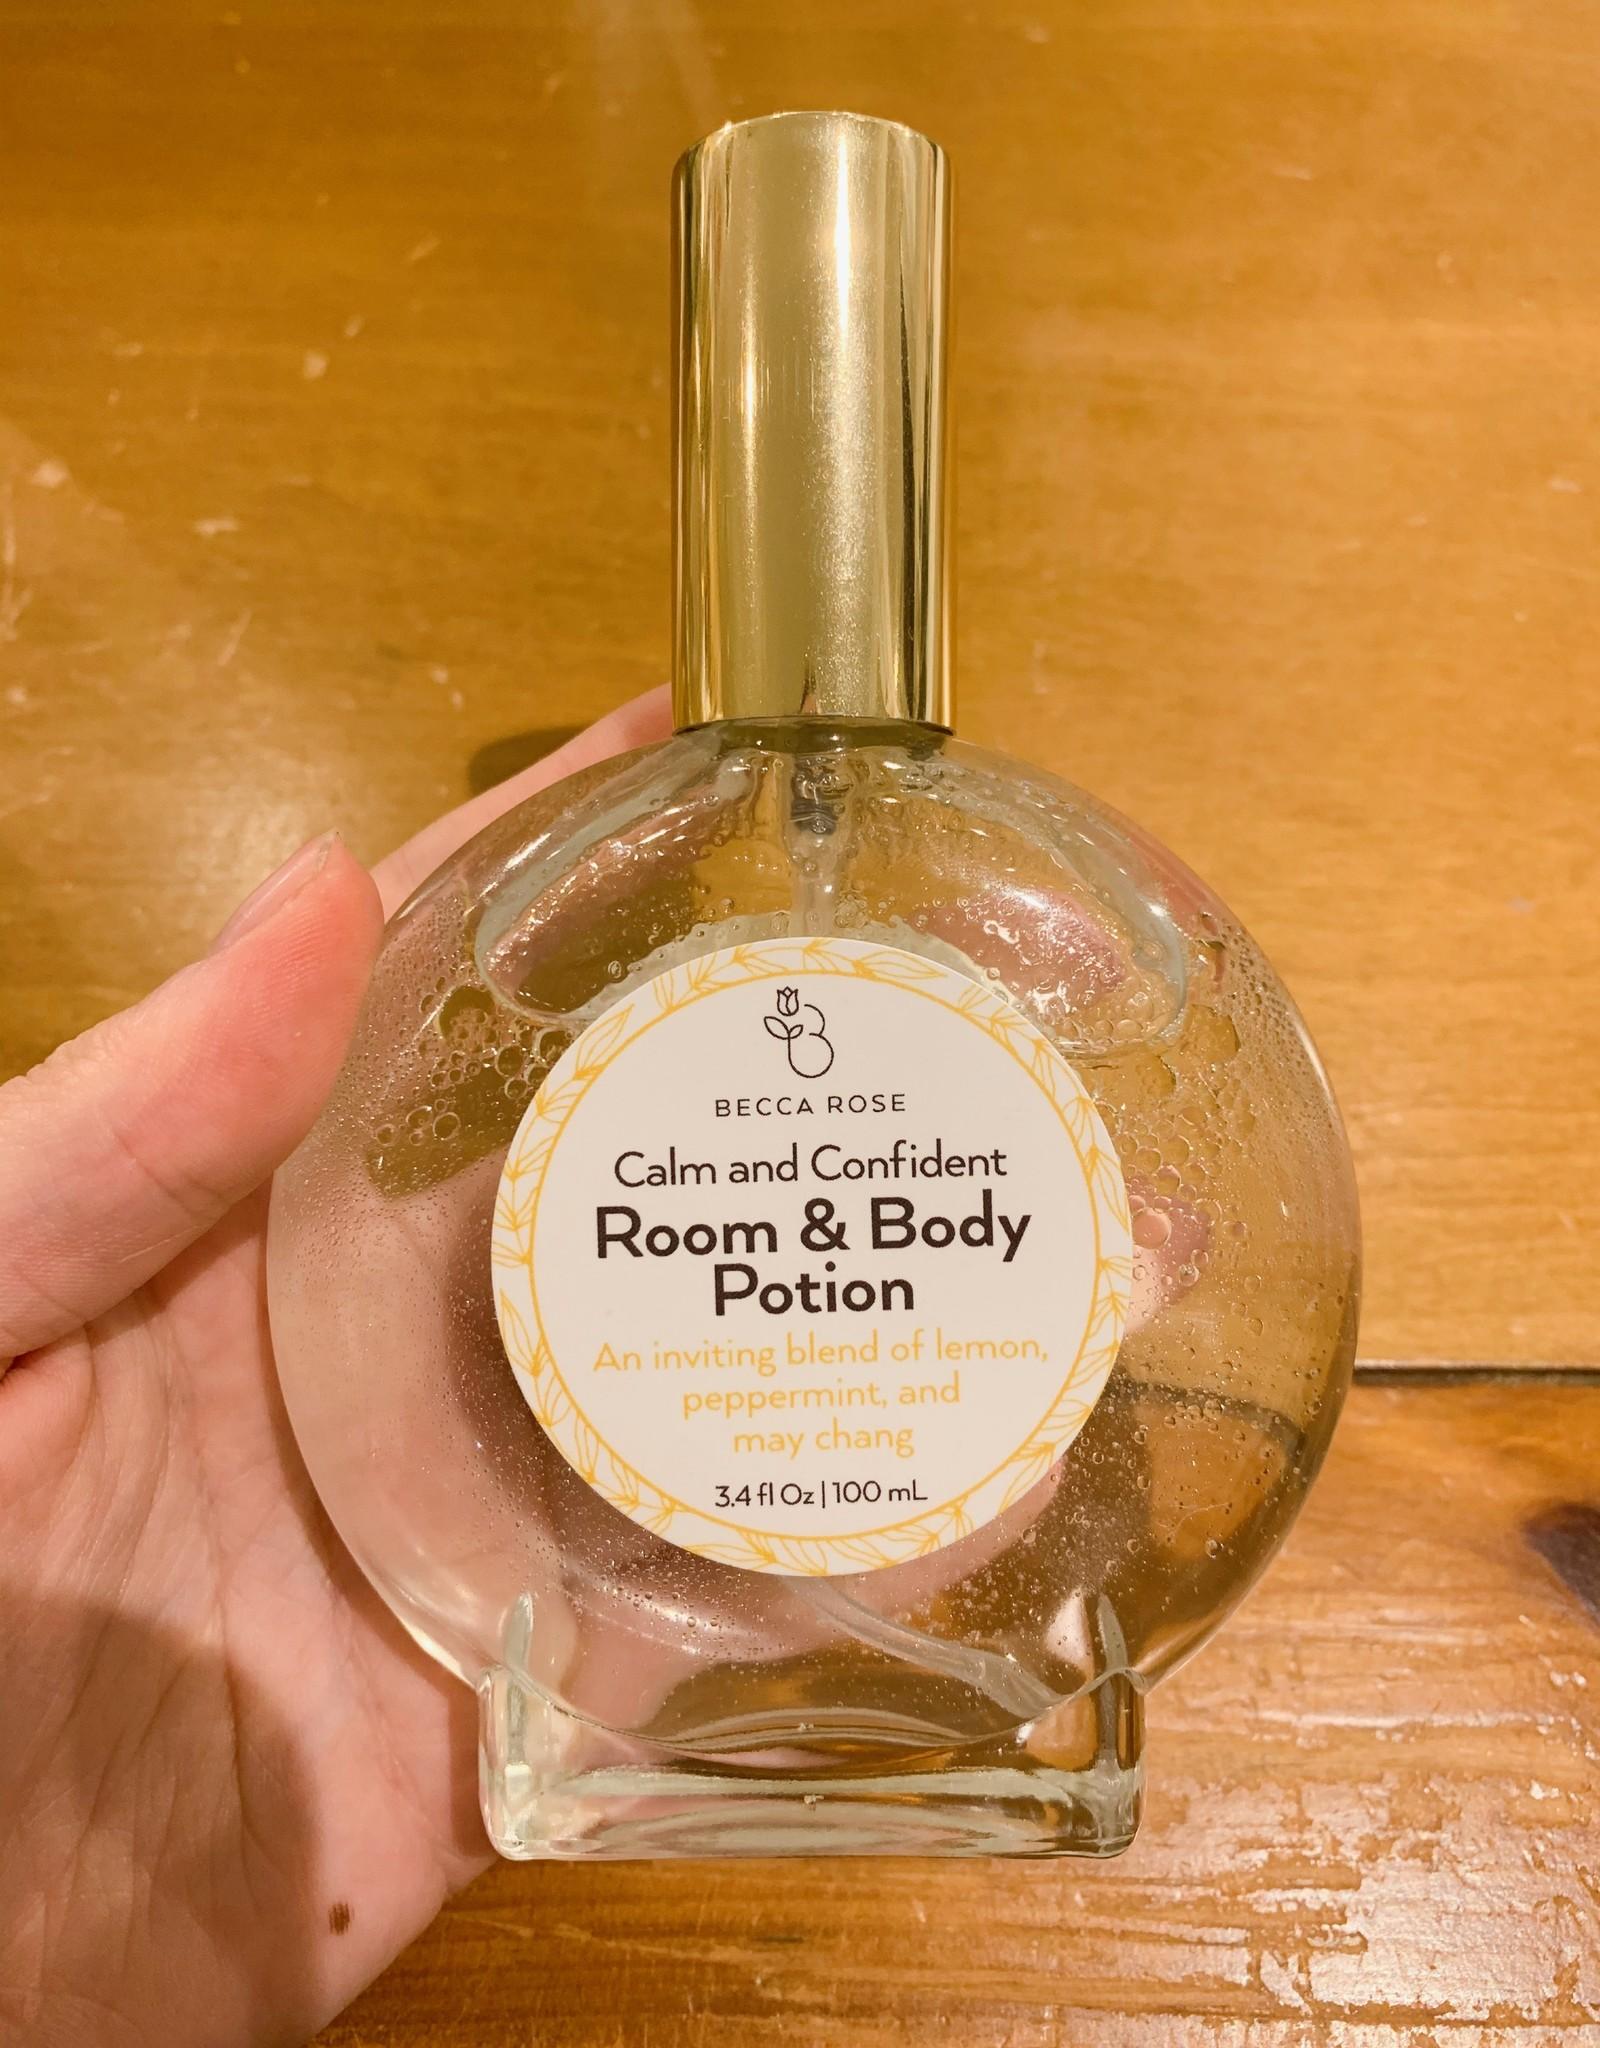 Becca Rose Room & Body Potion: Calm and Confident